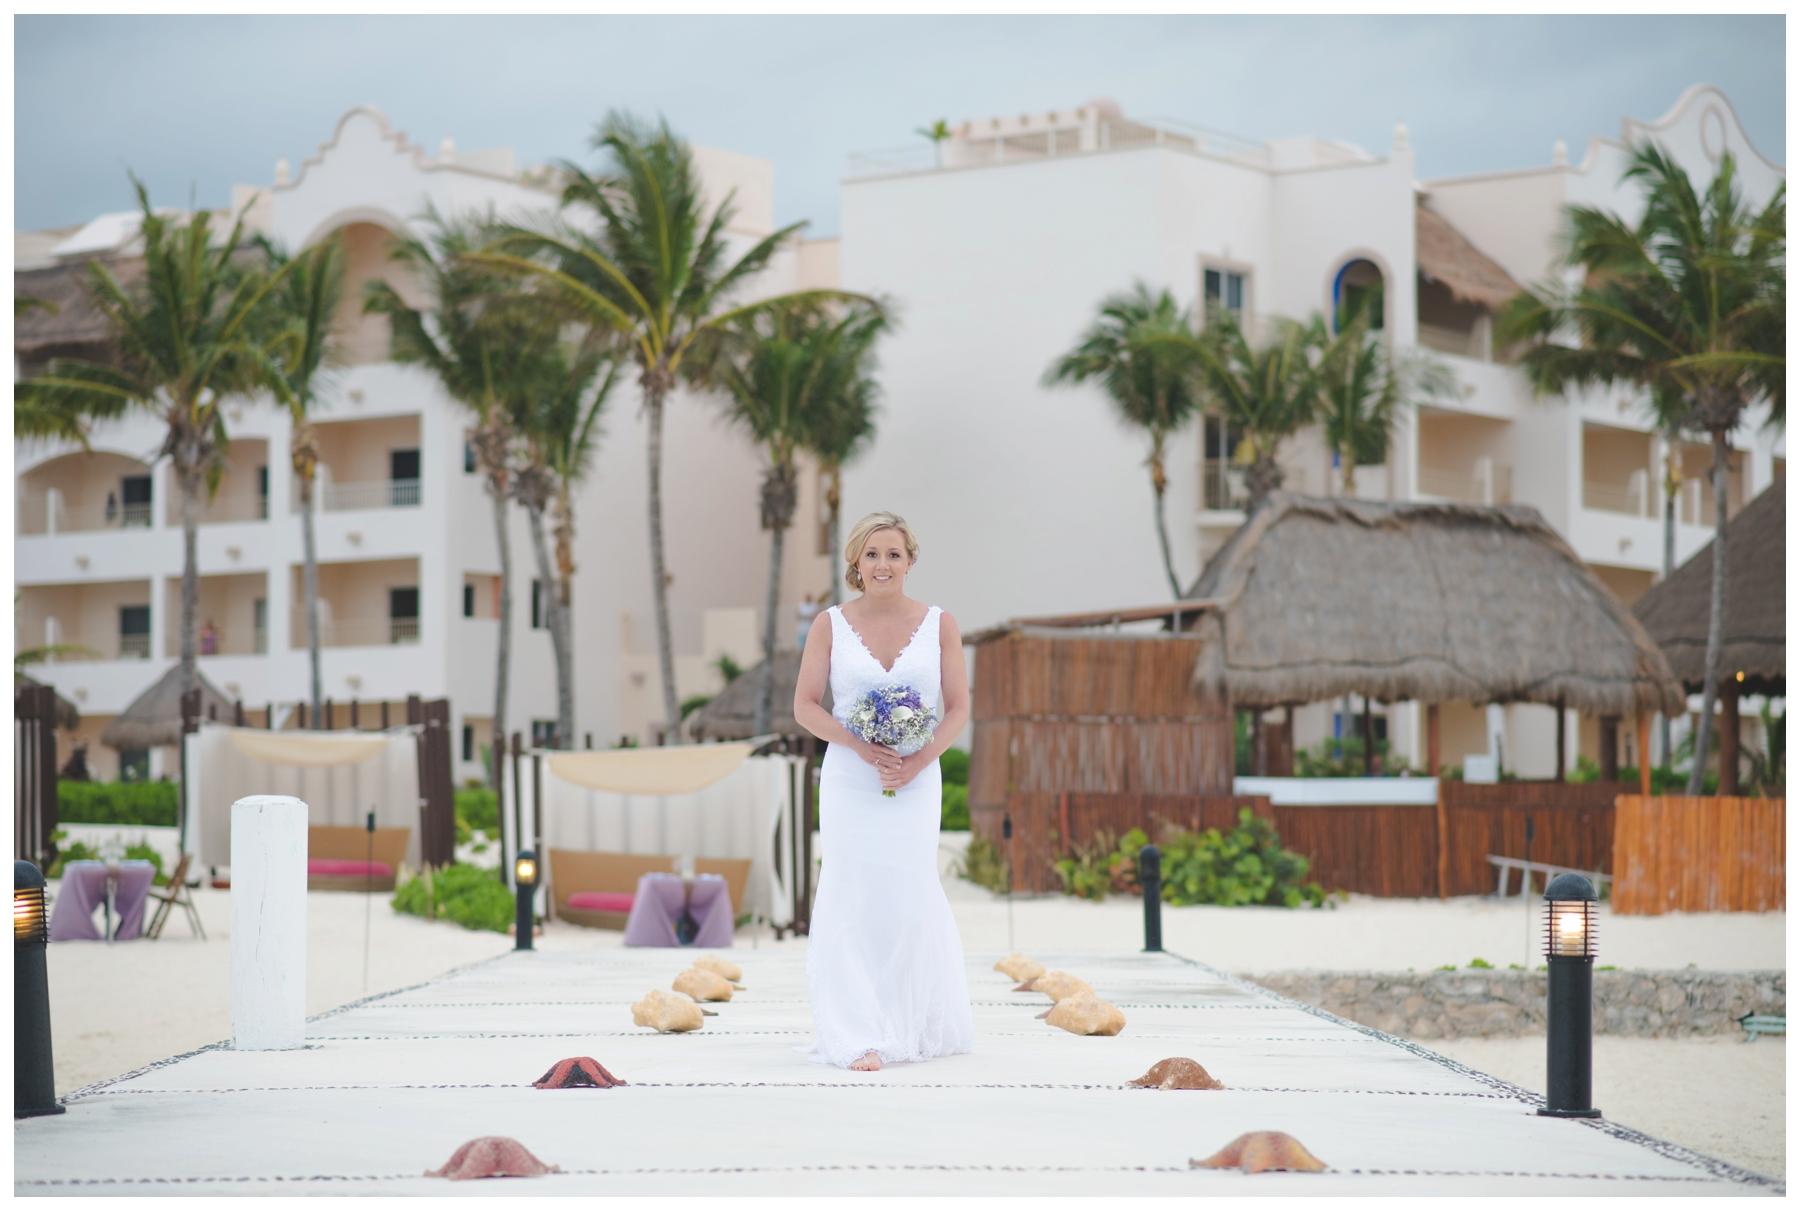 Cancun Riviera Maya Wedding_0004.jpg